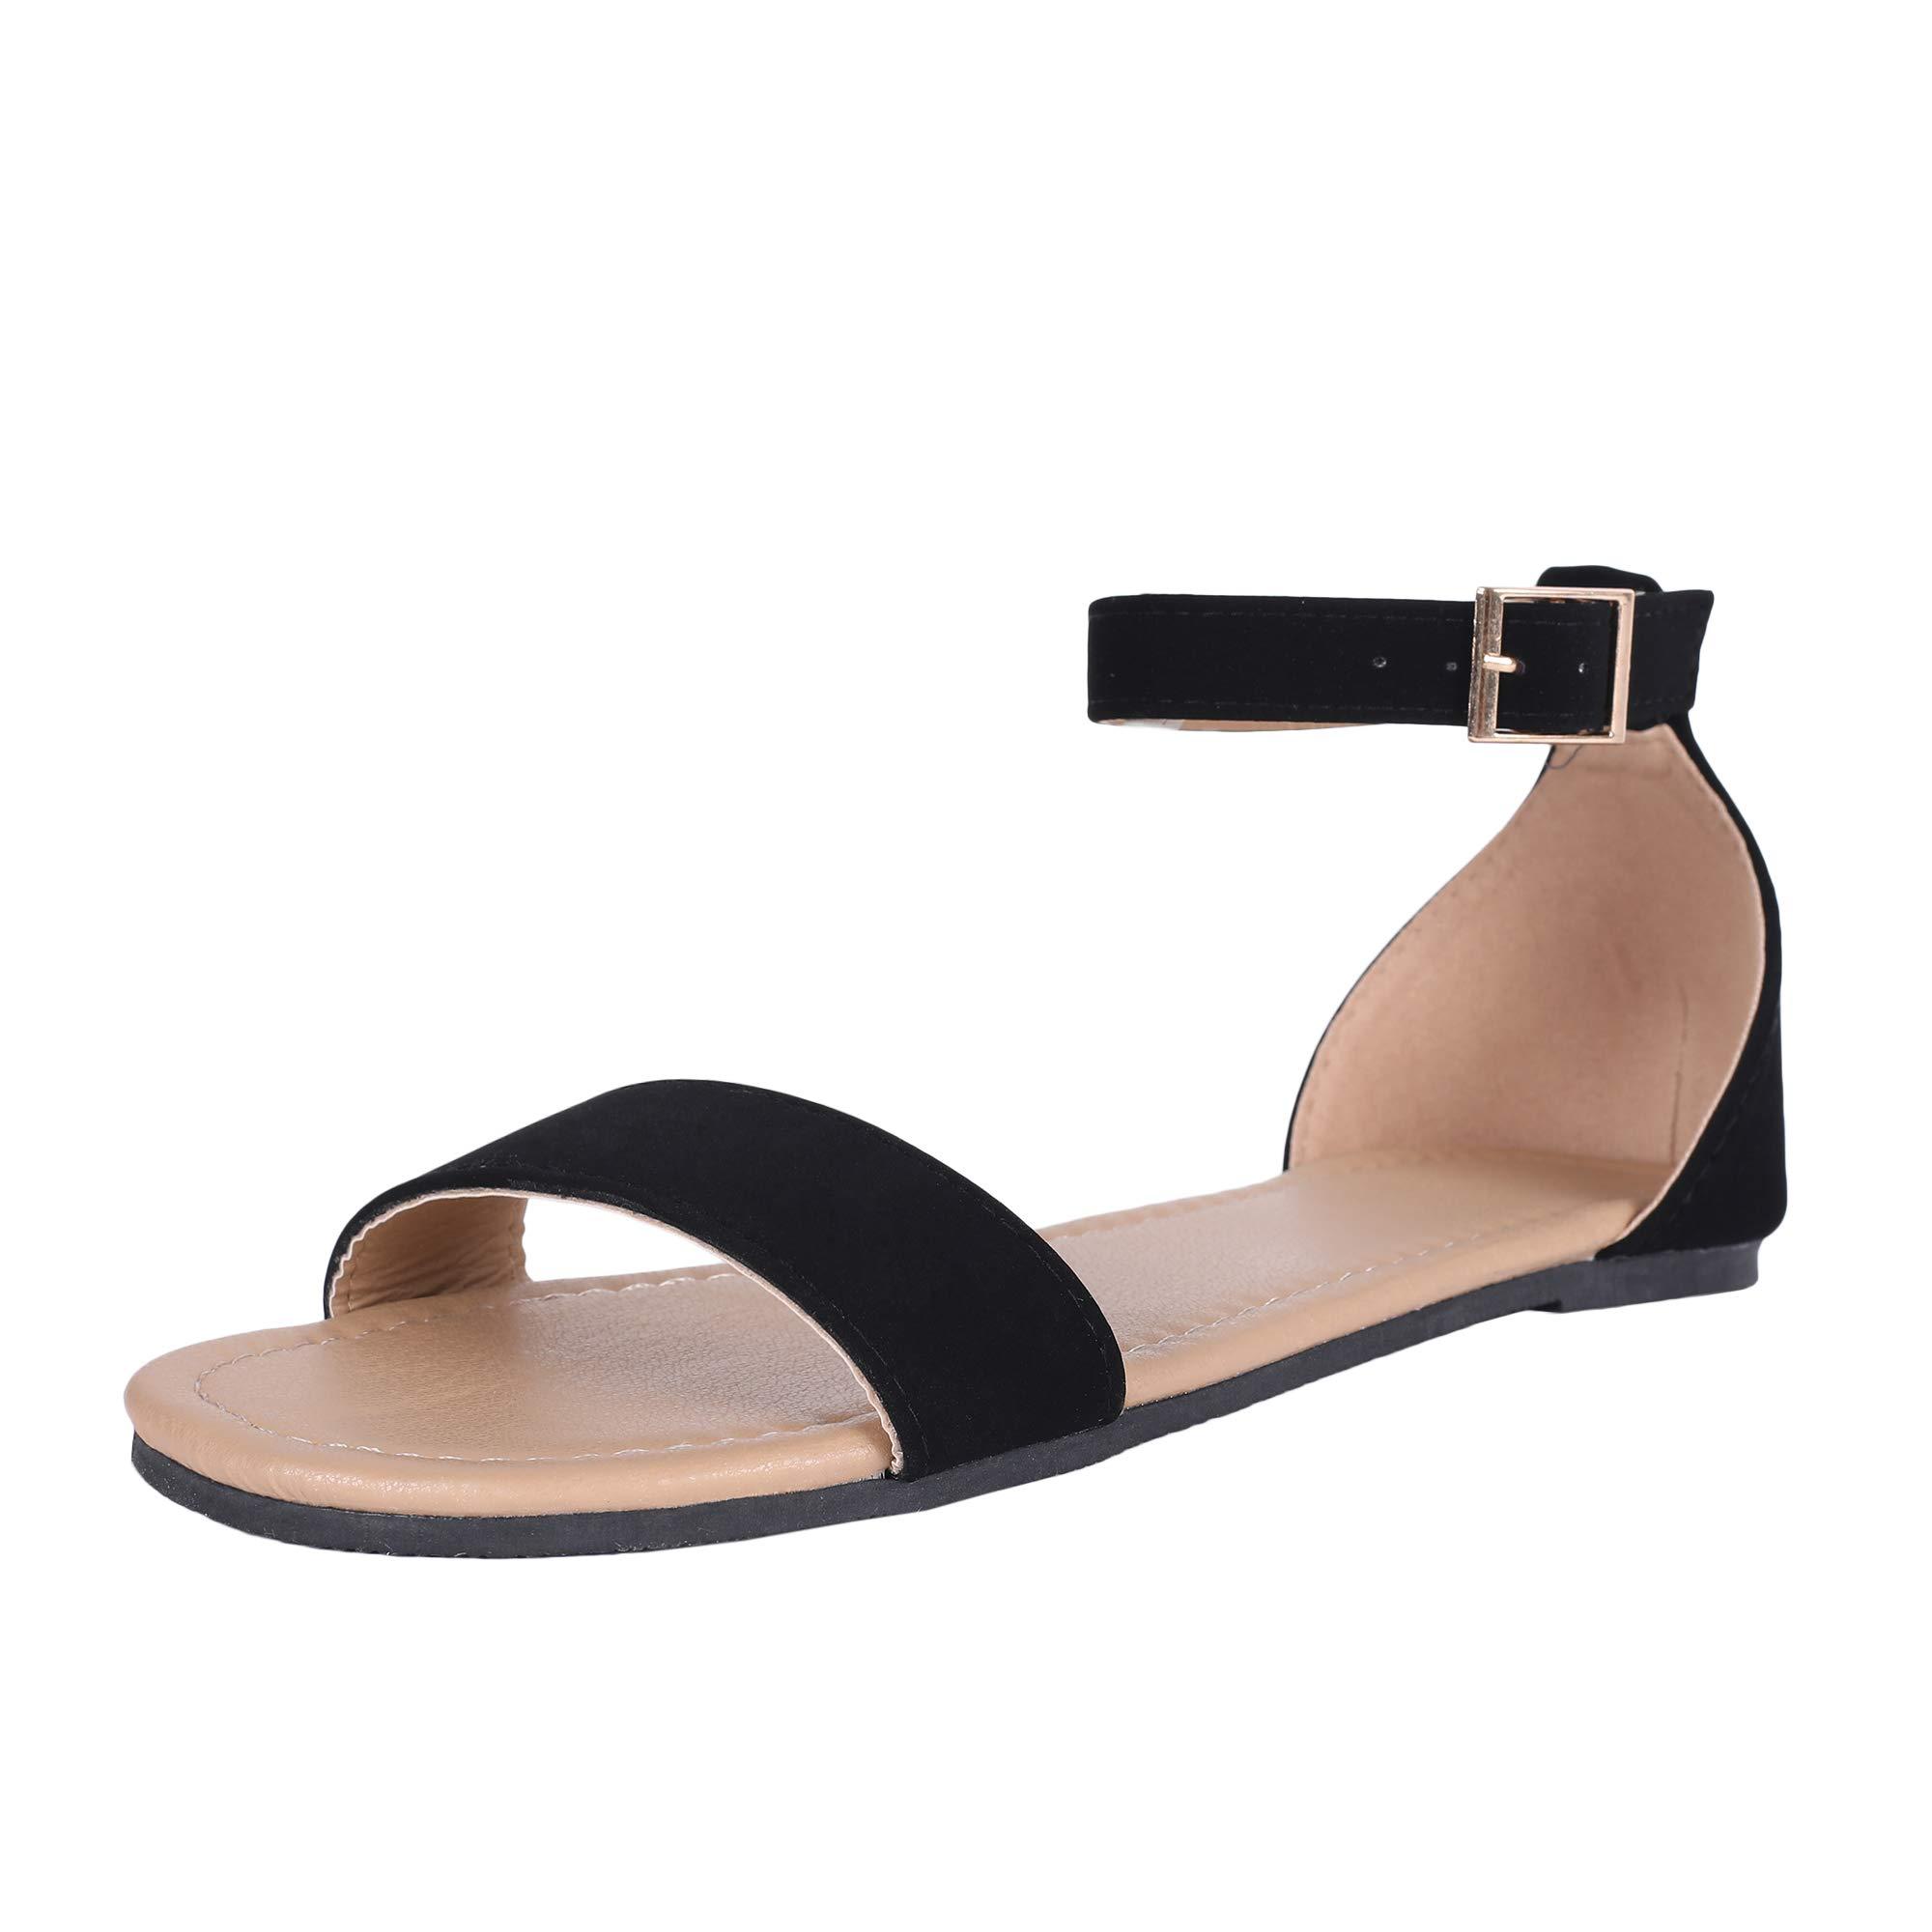 LAICIGO Womens Ankle Scalloped Strap Flat Sandals Open Toe Faux Suede Back Zipper Low Heel Summer Dress Casual Shoes